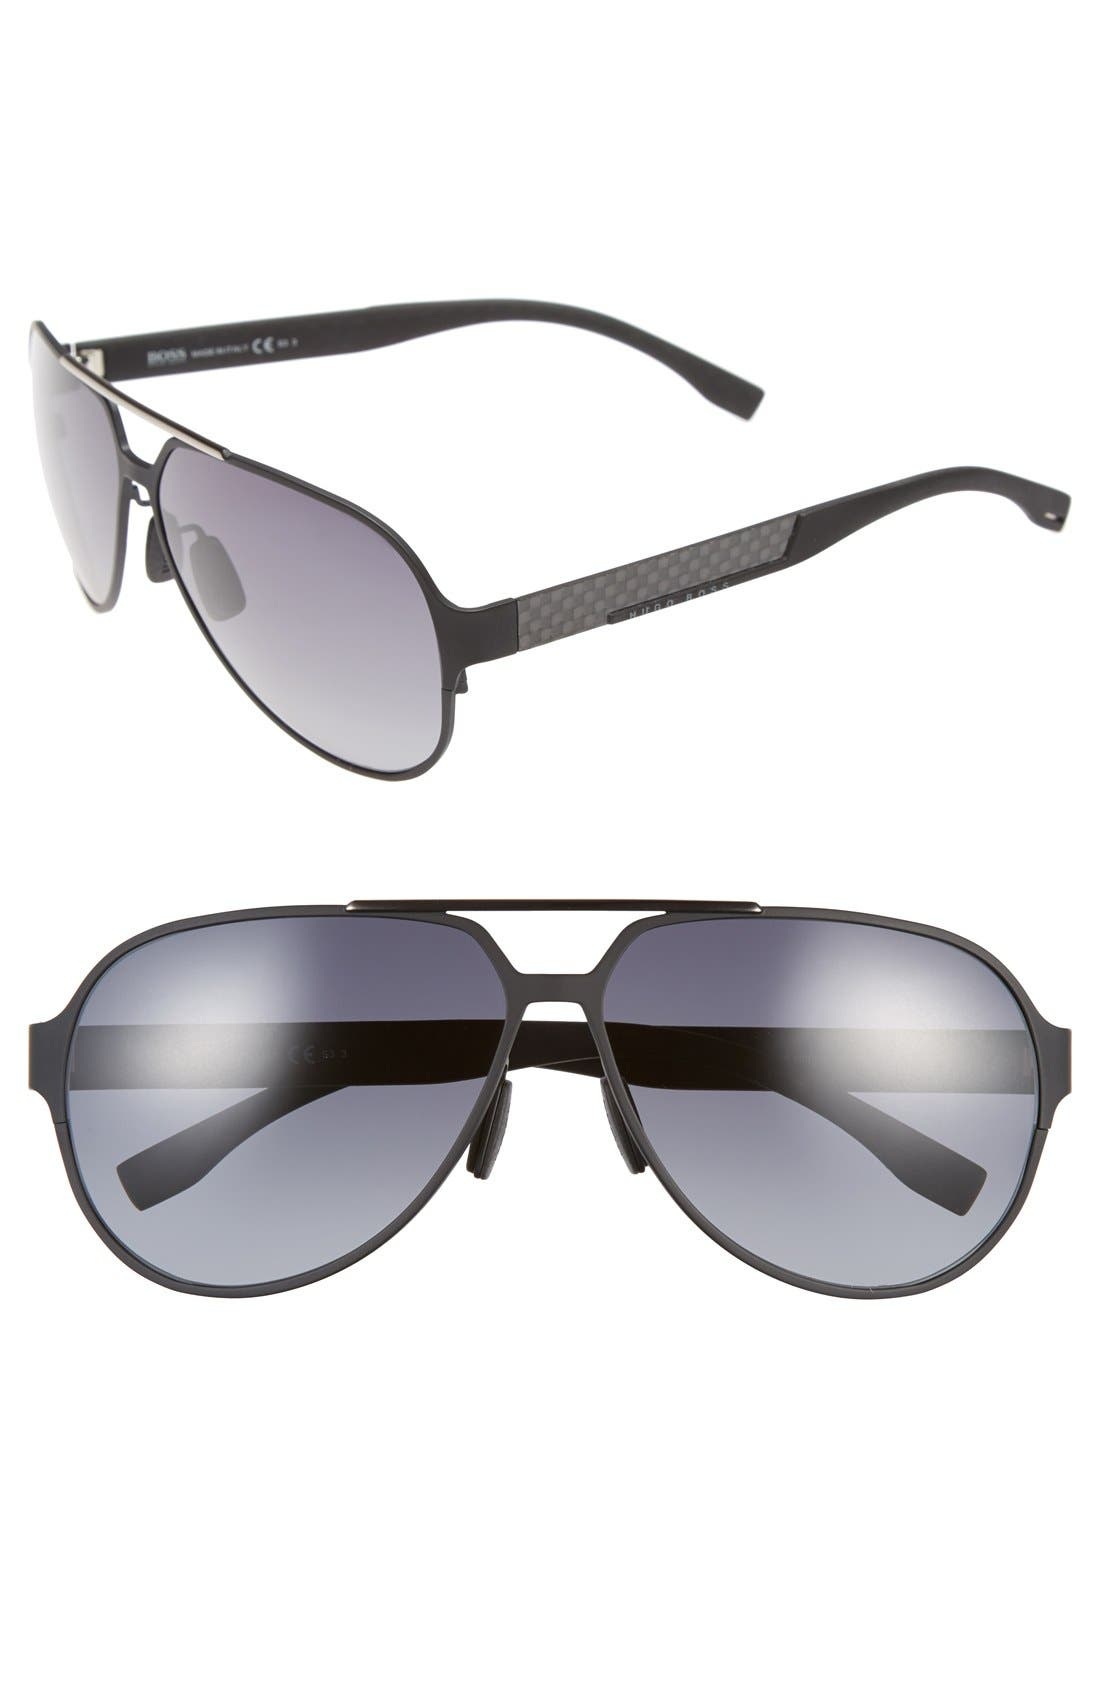 63mm Aviator Sunglasses,                             Main thumbnail 1, color,                             Black Ruthenium/ Grey Gradient